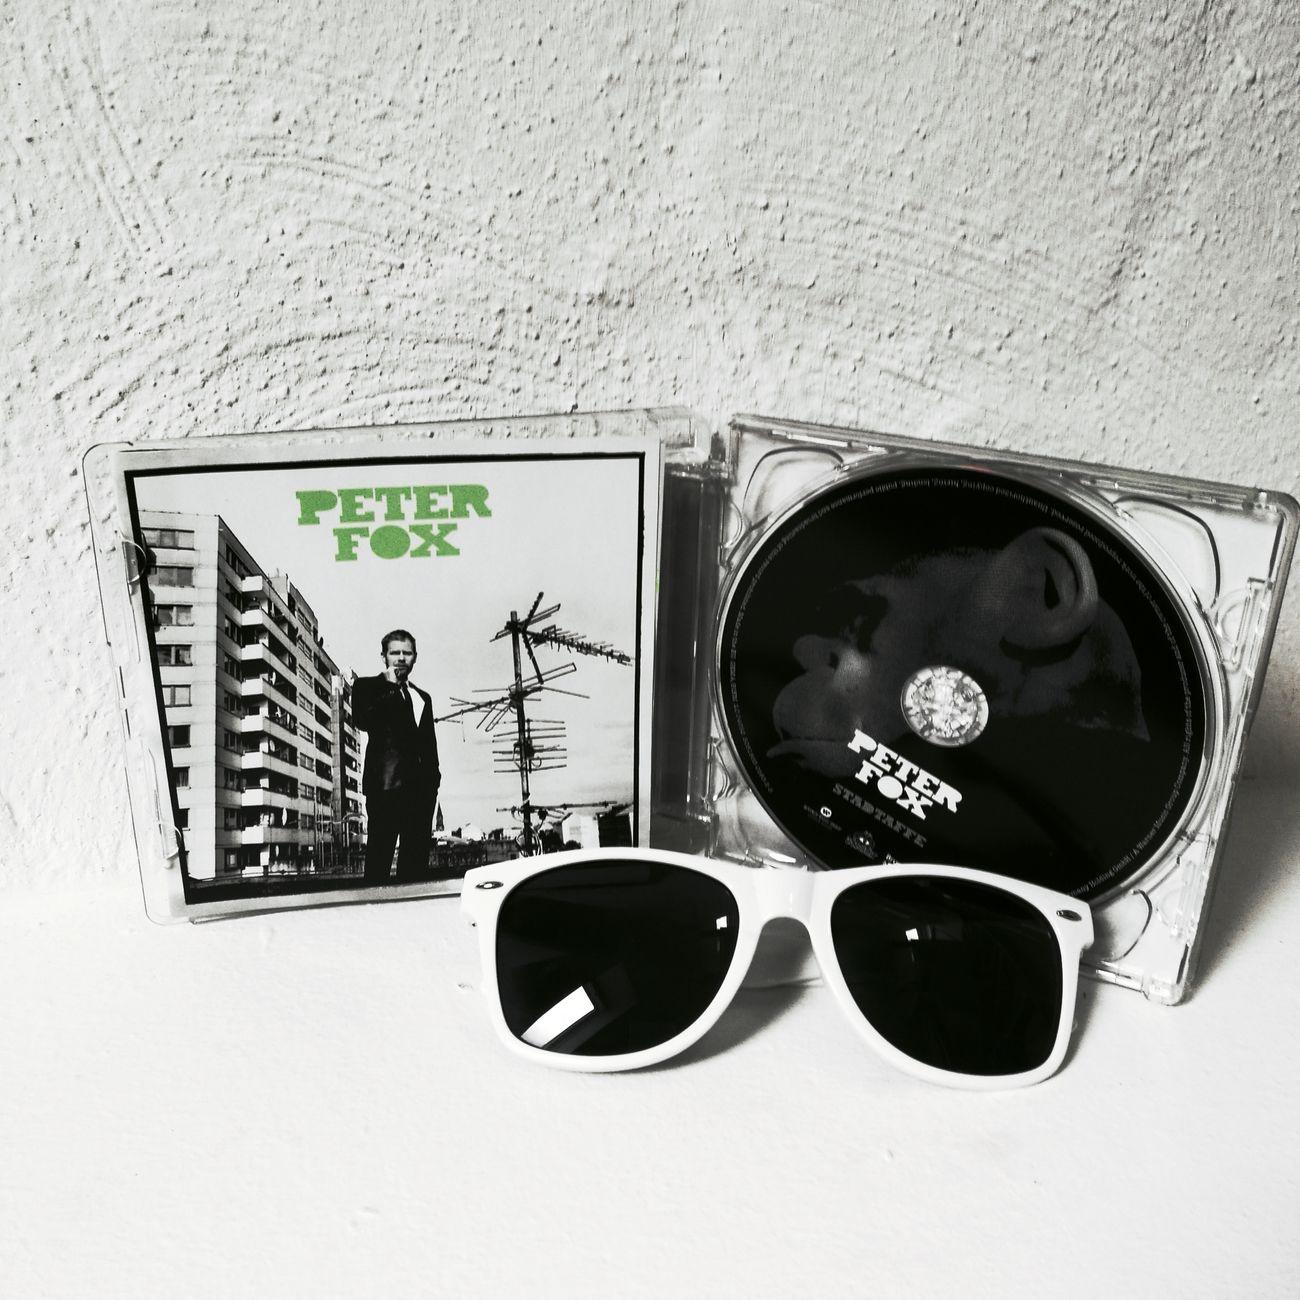 First Eyeem Photo Stadtaffe Spartan PeterFox Glasses Sunglasses StandART Idea Stil Style